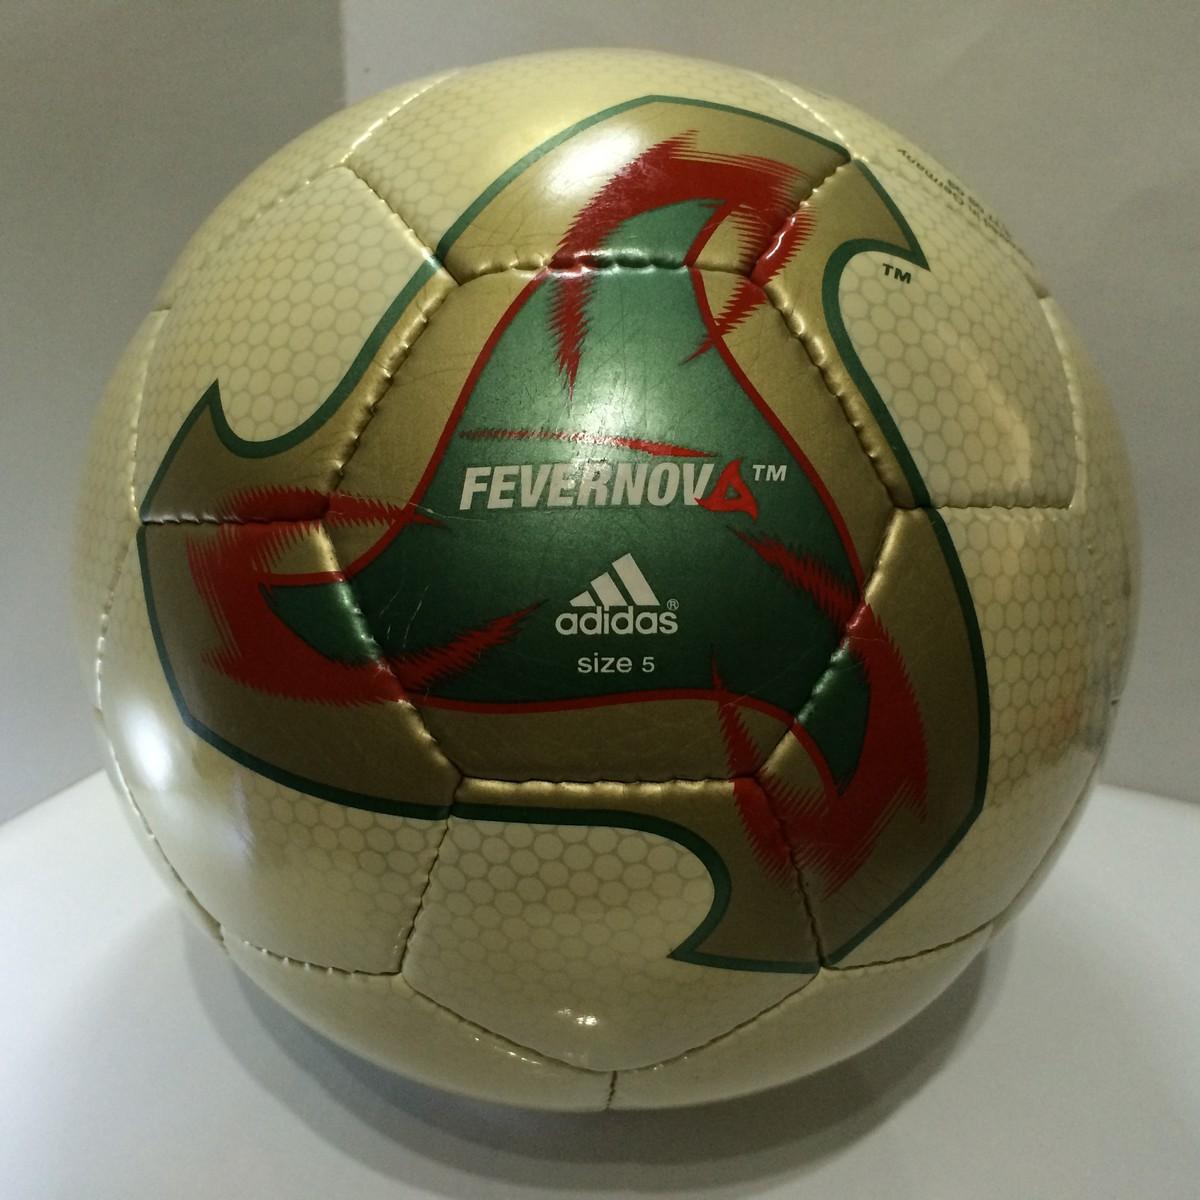 Adidas Fevernova Regular Omb Matchballs Eu